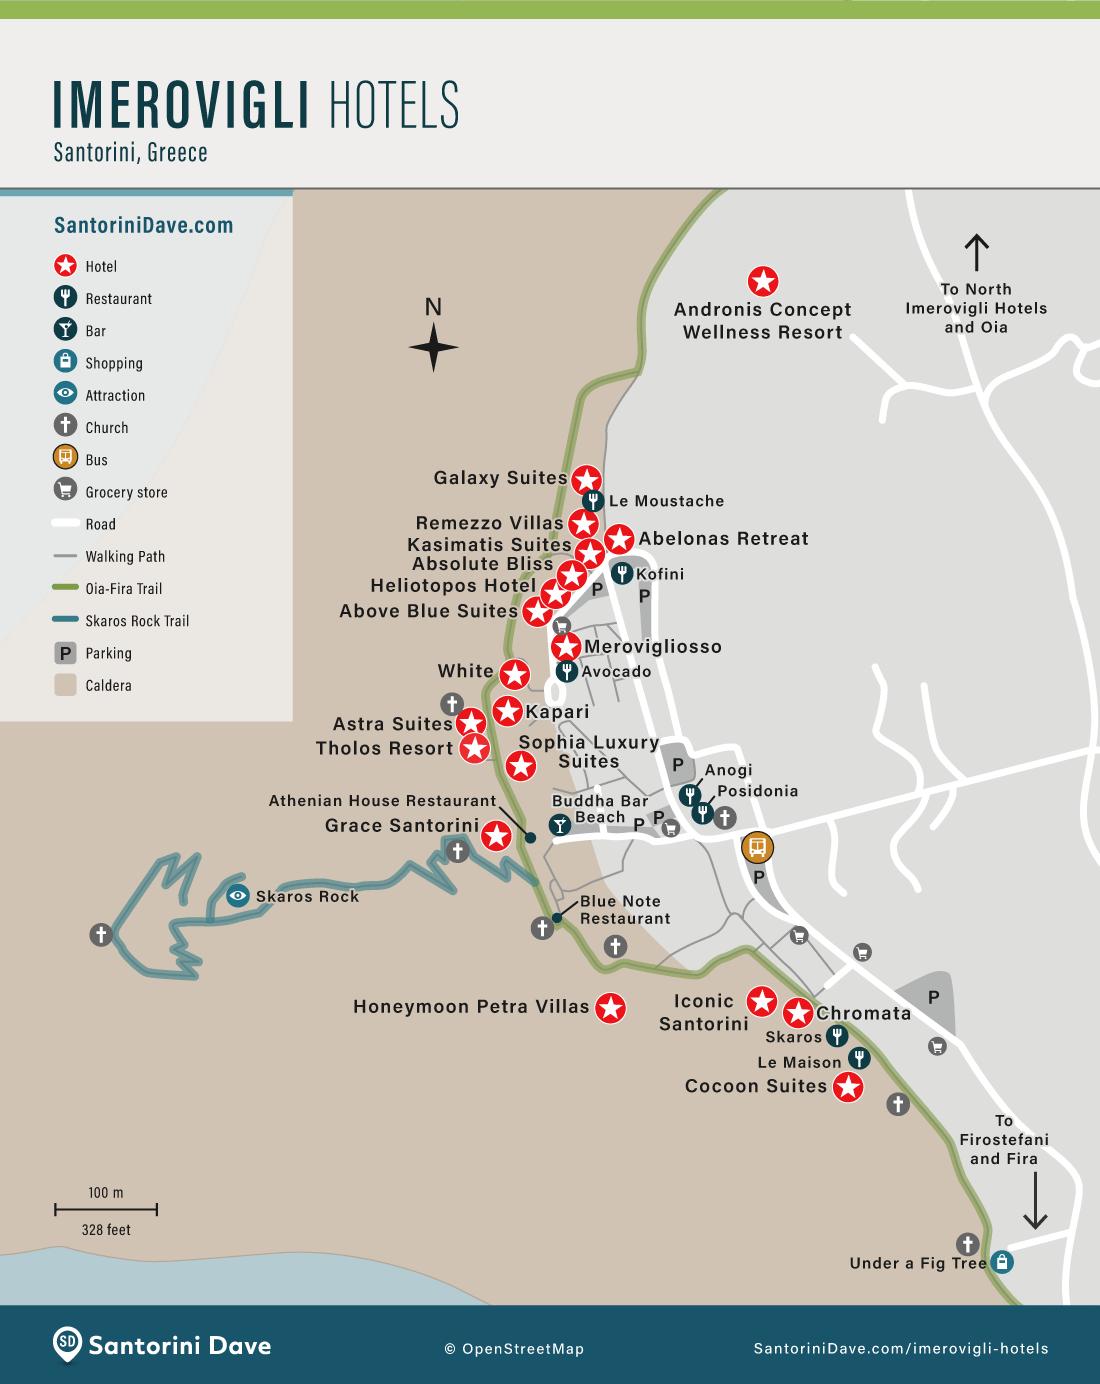 Map of the Best Hotels in Imerovigli, Santorini